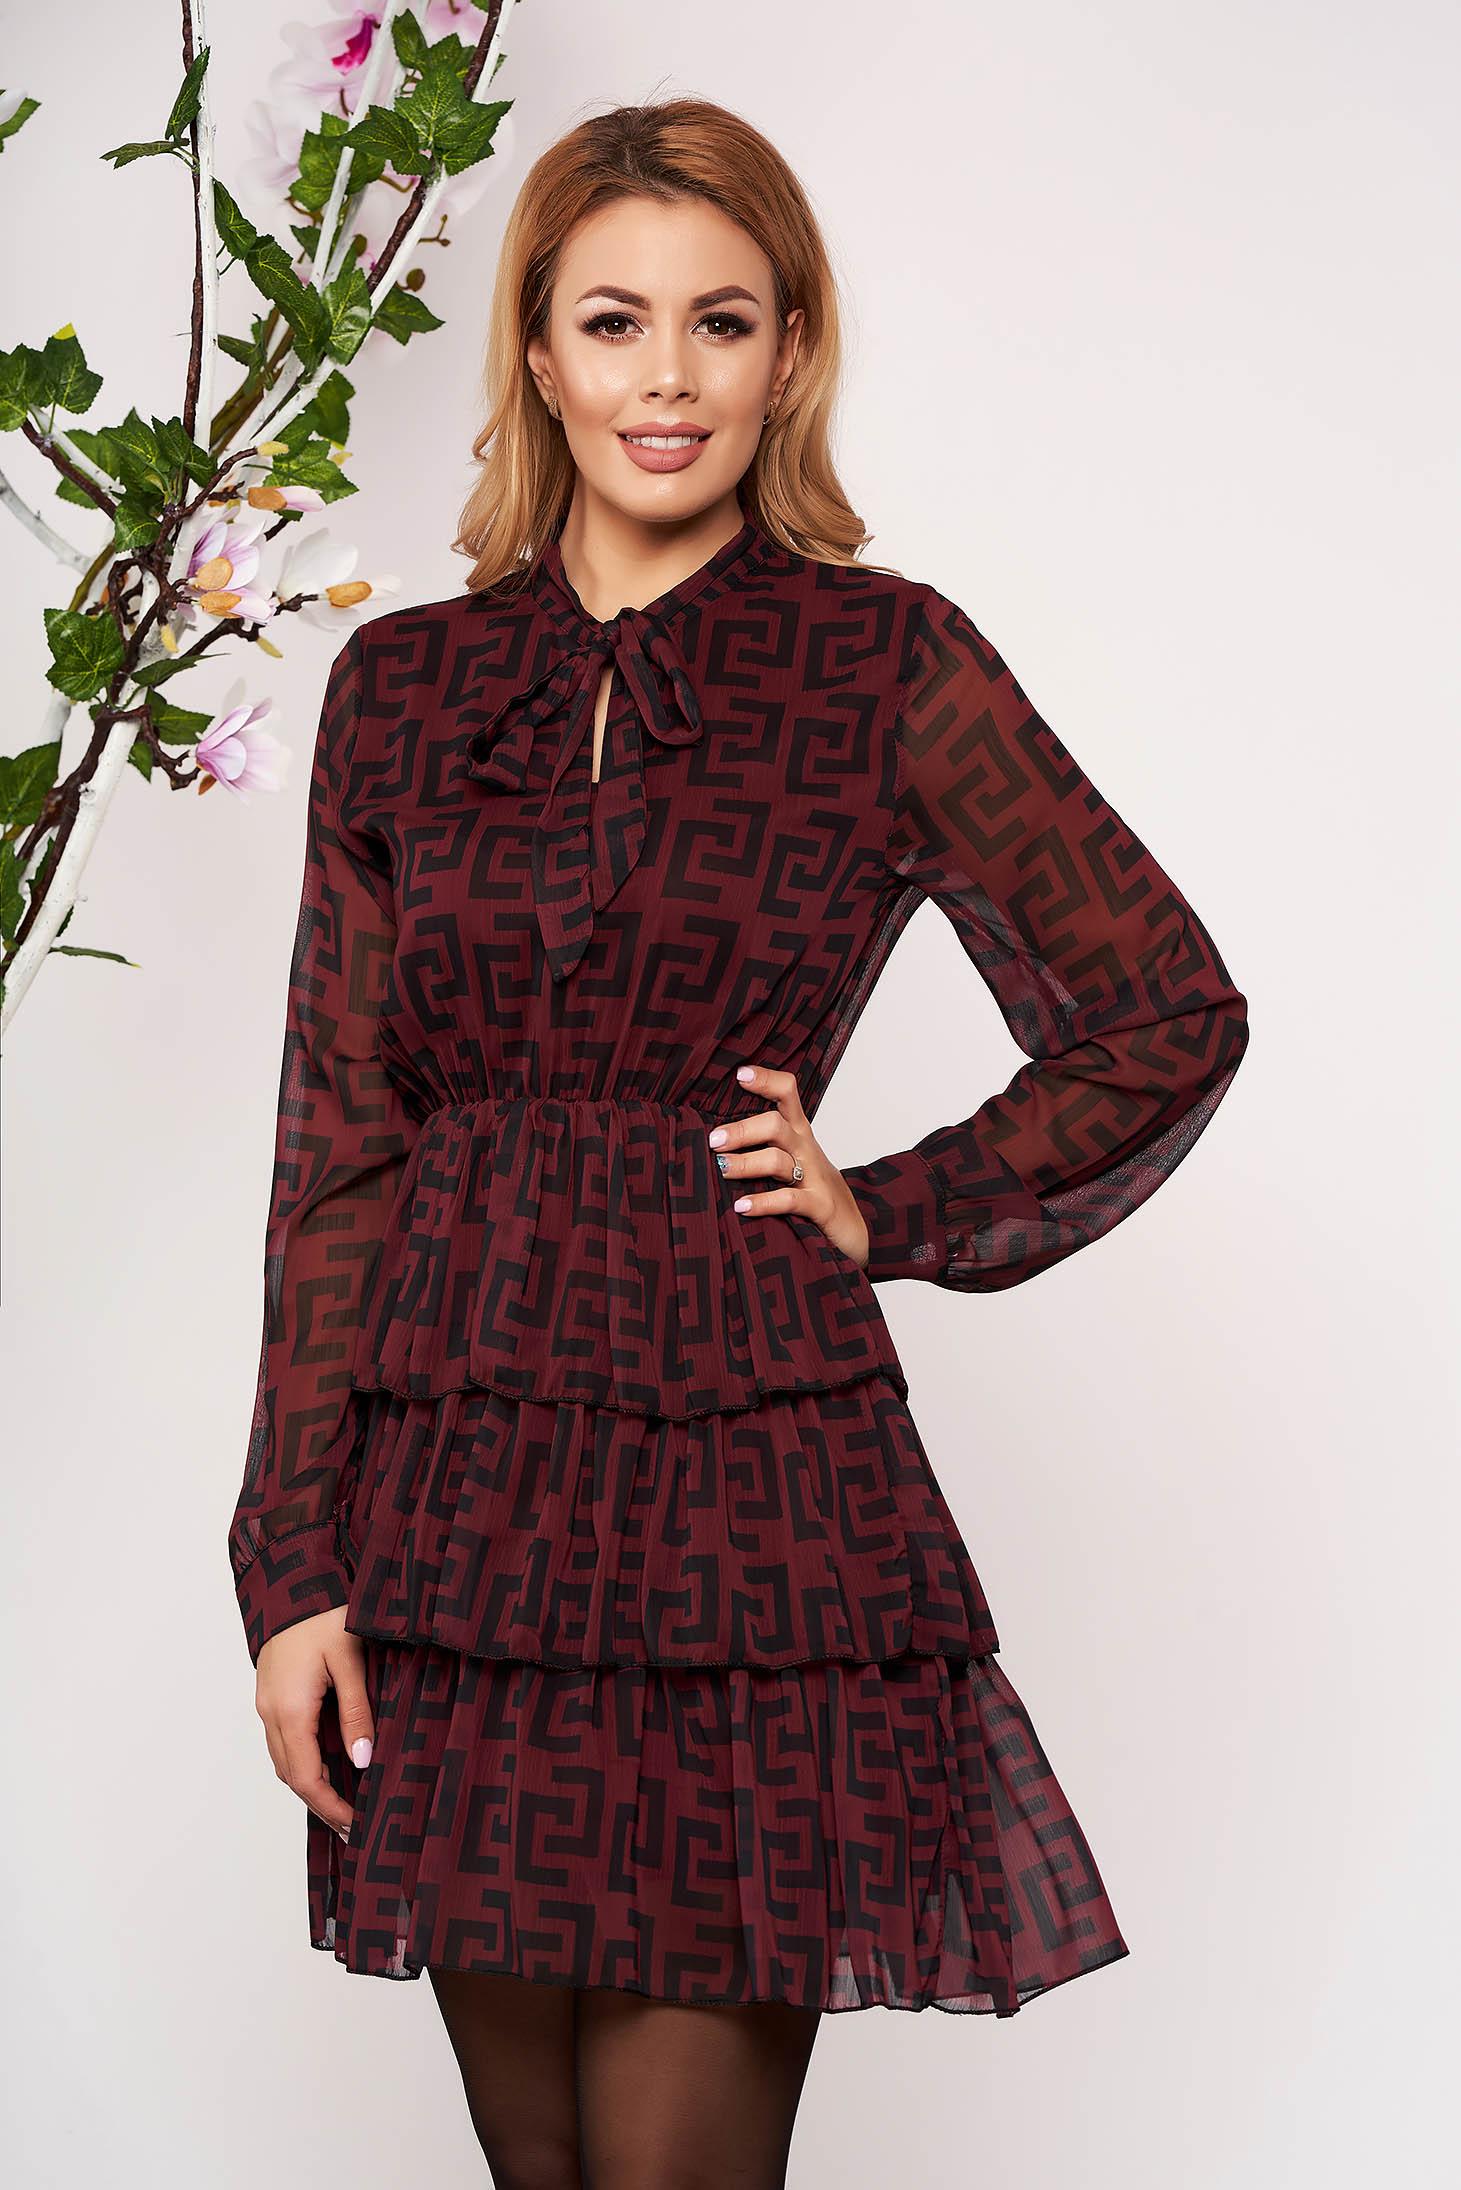 Burgundy dress daily short cut cloche airy fabric long sleeved